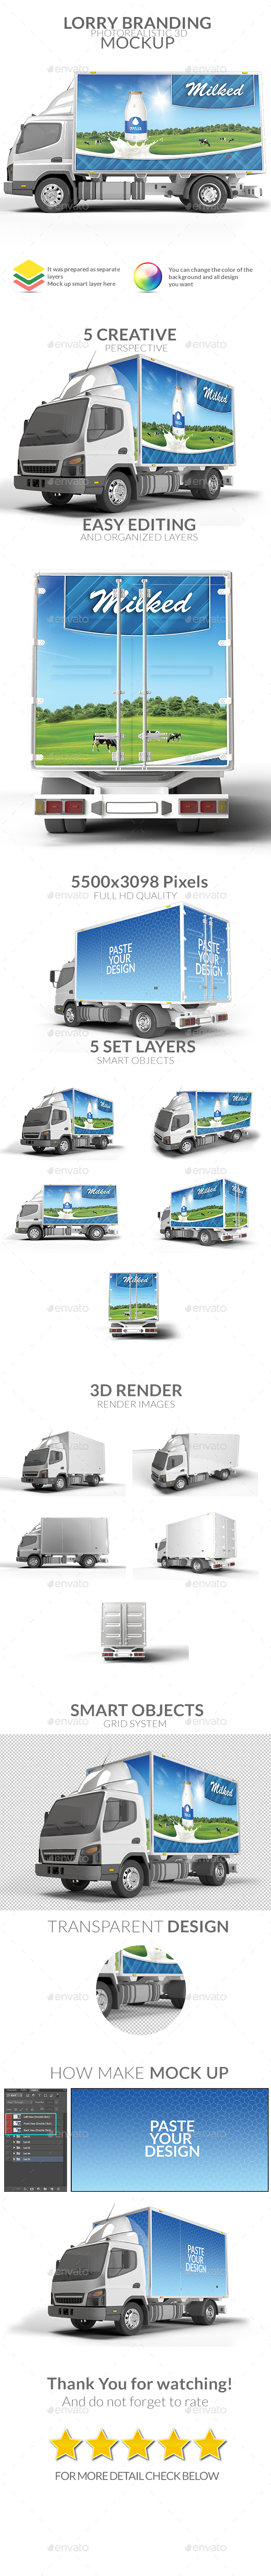 Lorry Branding Mock Up - Photorealistic Mock Up - Vehicle Wraps Print